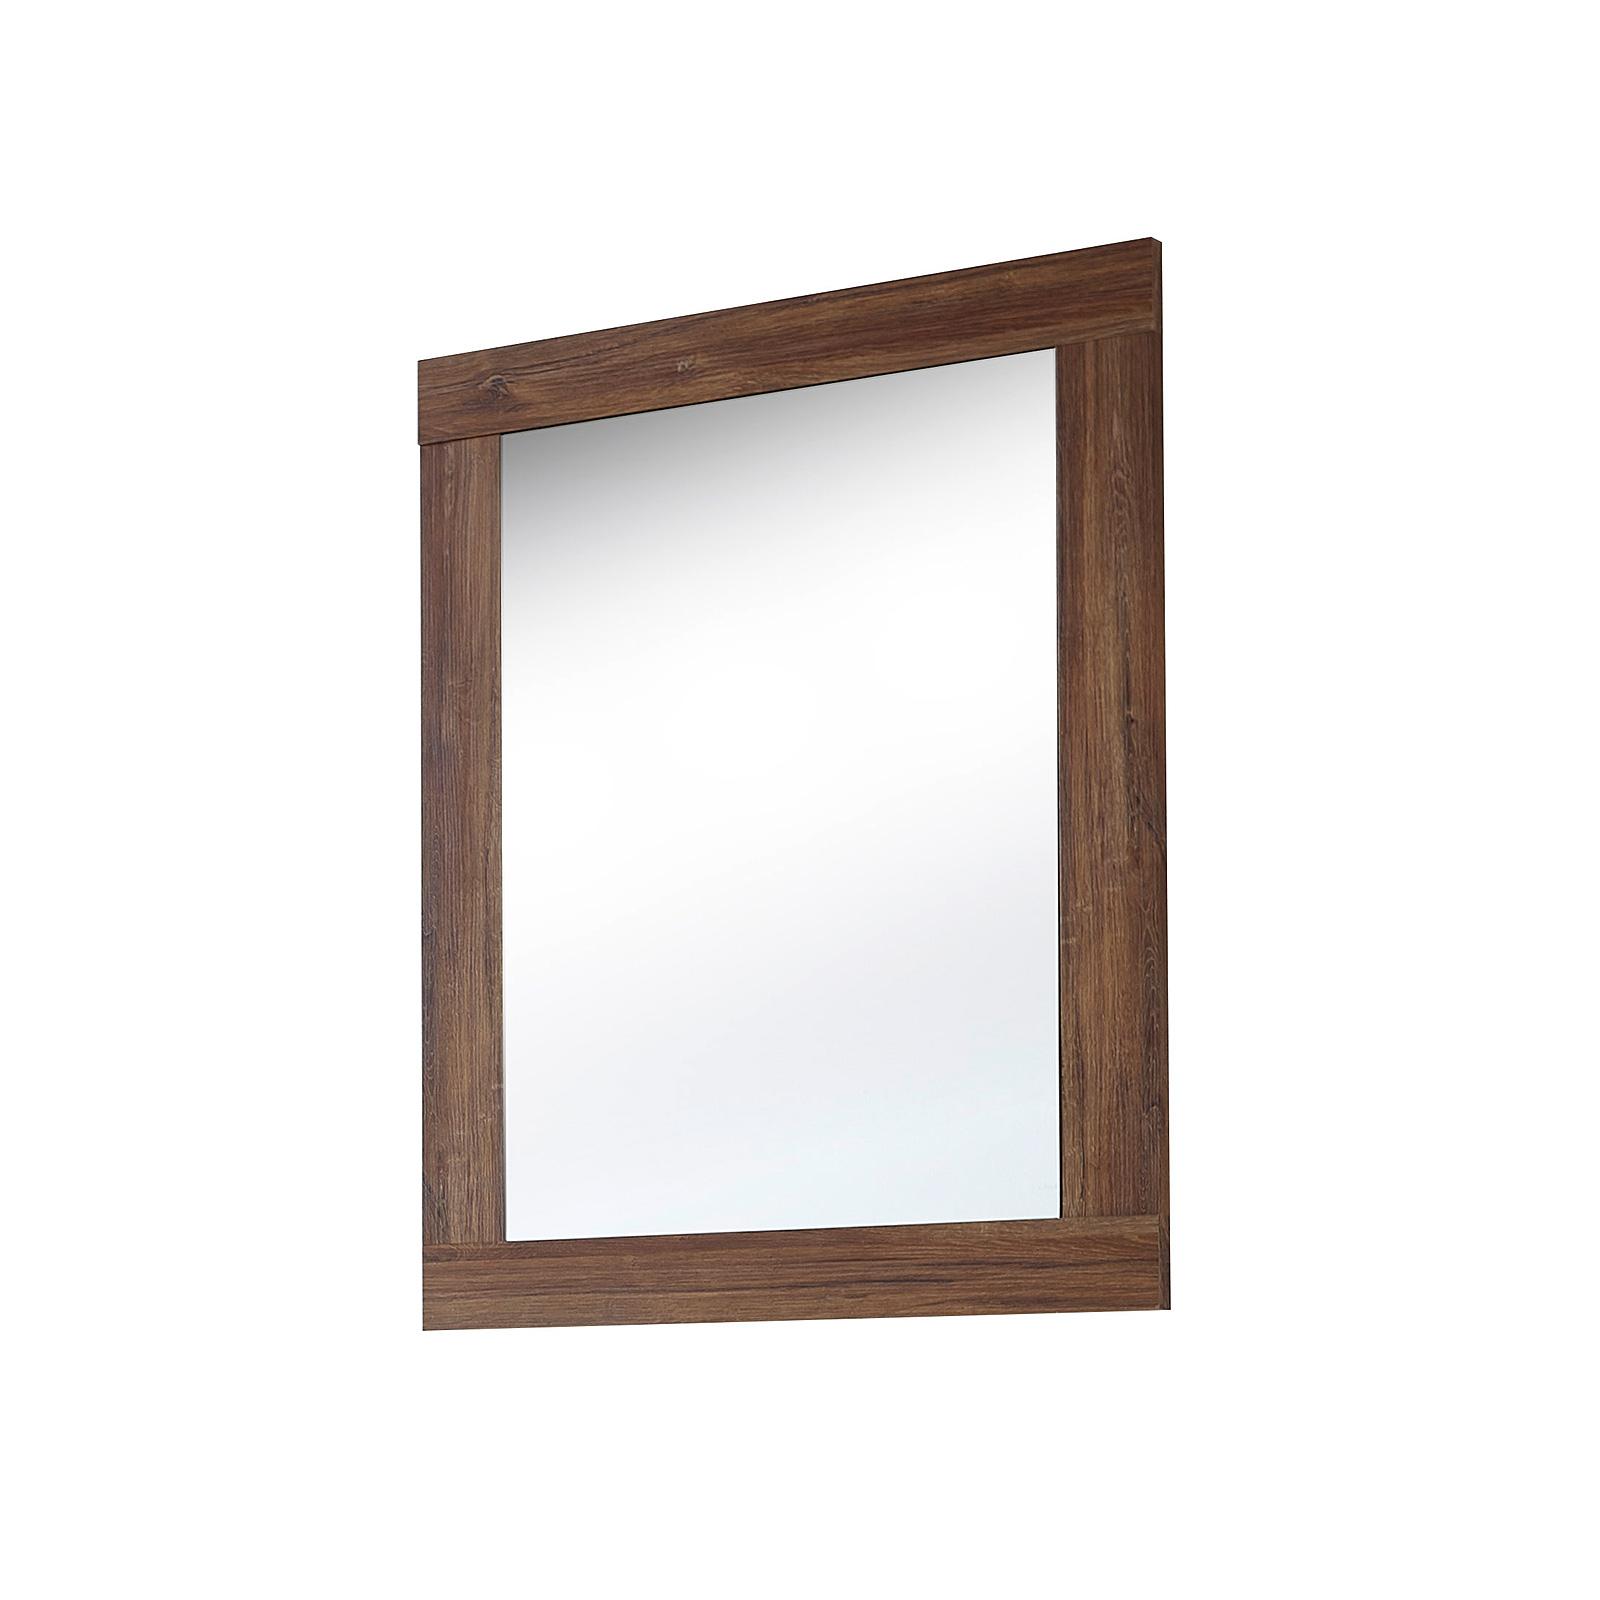 spiegel br ssel wandspiegel h ngespiegel dekospiegel akazie dunkel 65 ebay. Black Bedroom Furniture Sets. Home Design Ideas